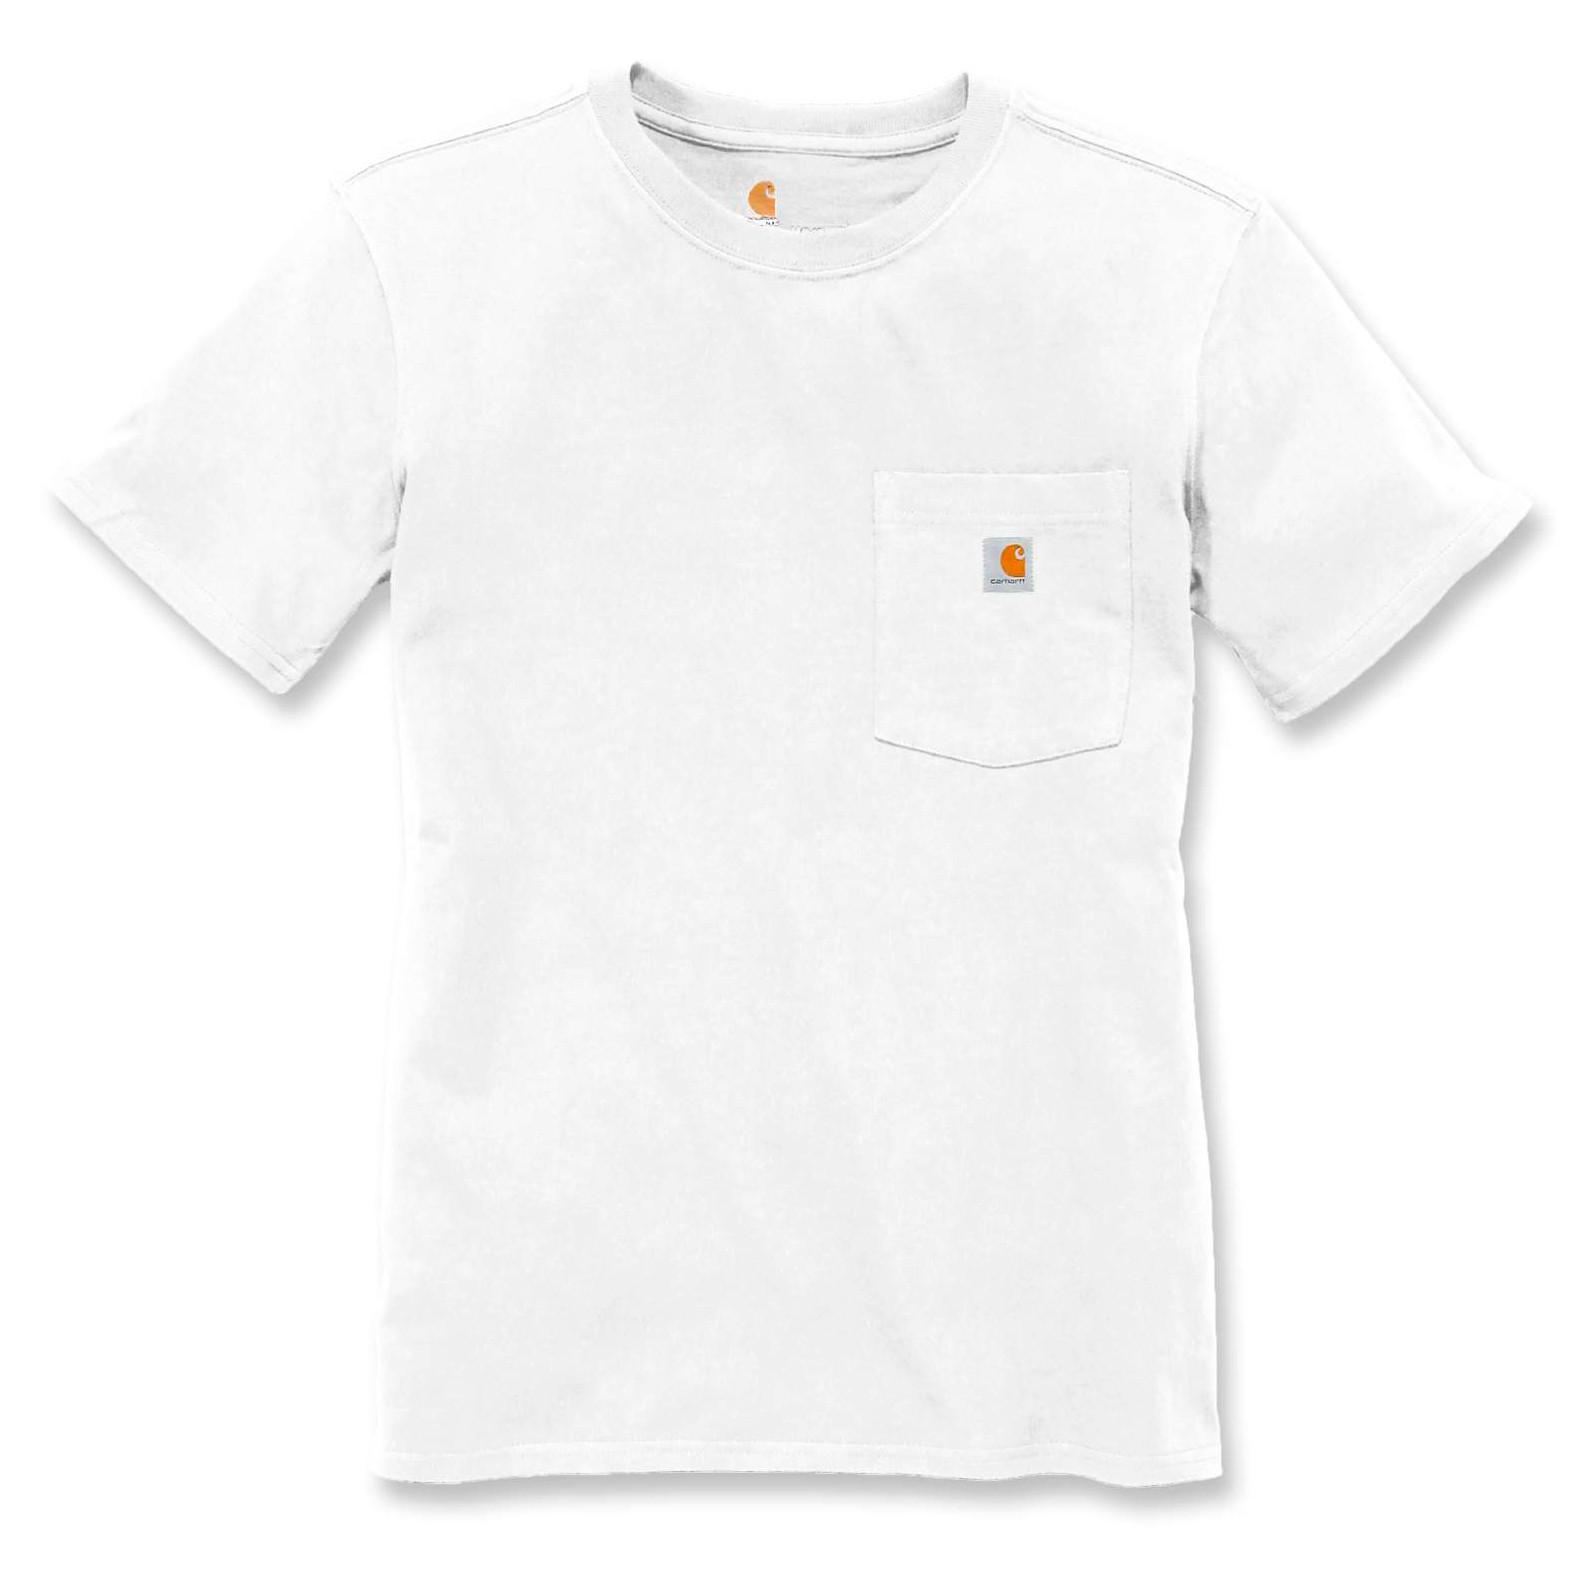 Футболка женская Carhartt WK87 Workwear Pocket T-Shirt - 103067 (White, S)